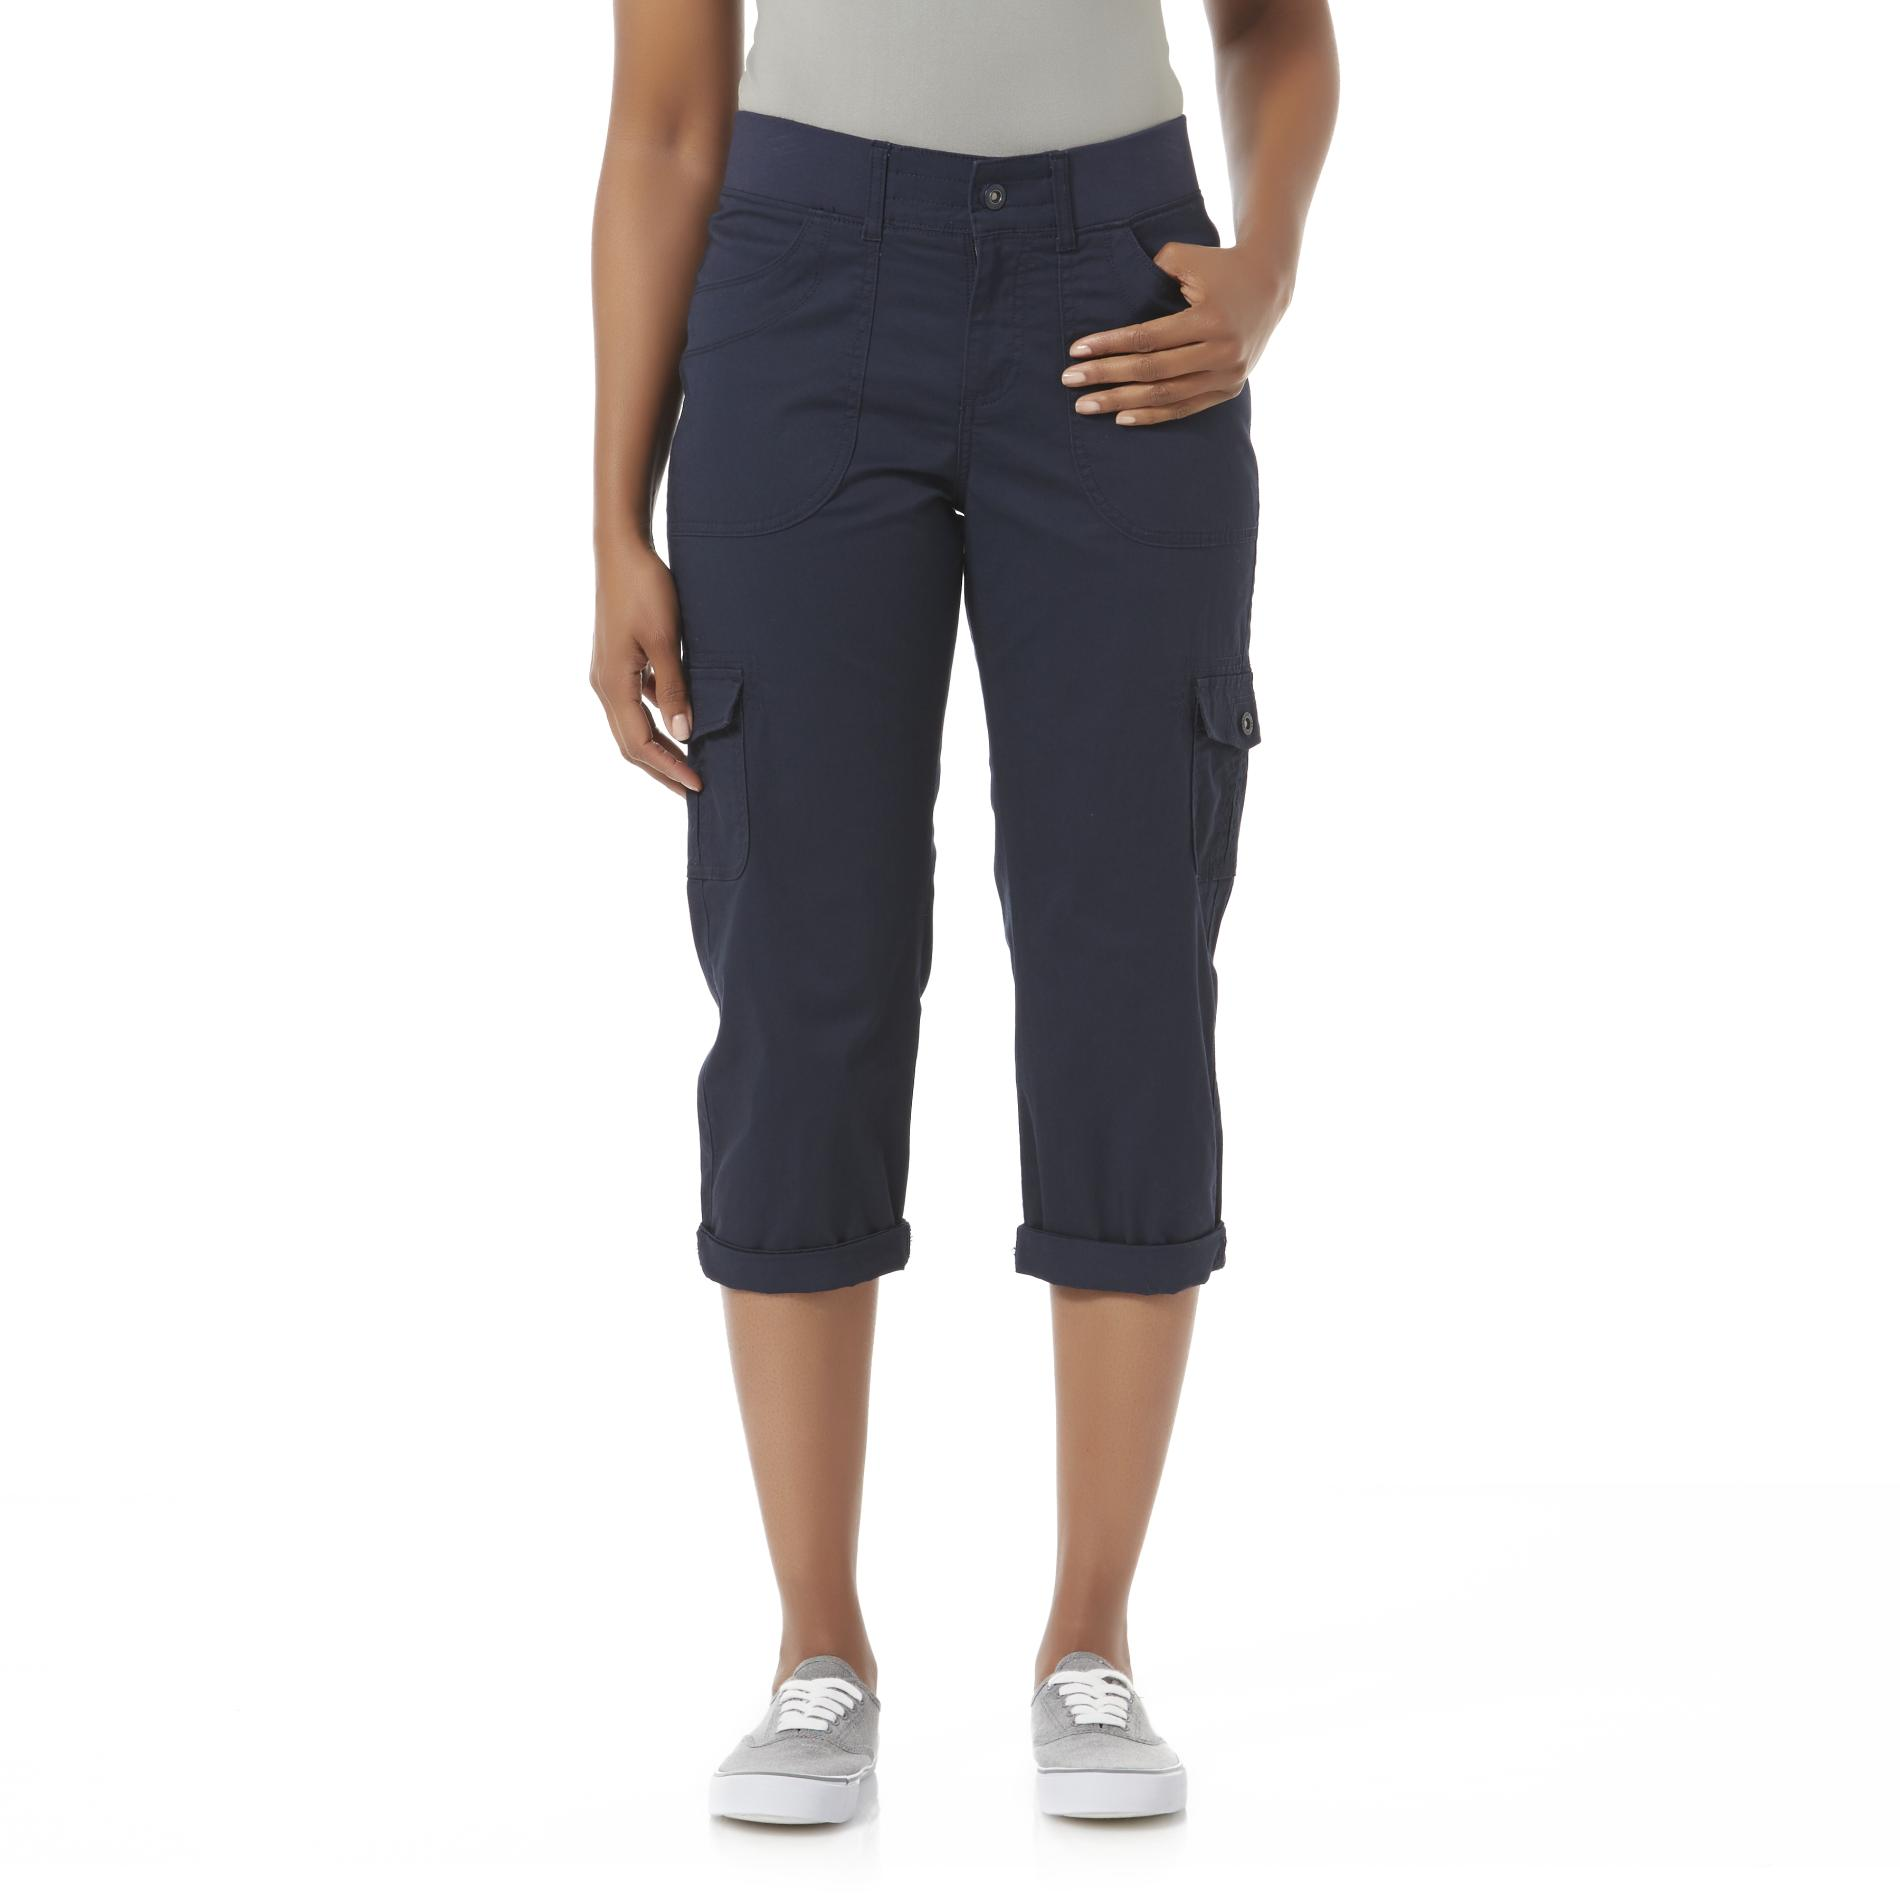 LEE Women's Relaxed Fit Capri Cargo Pants